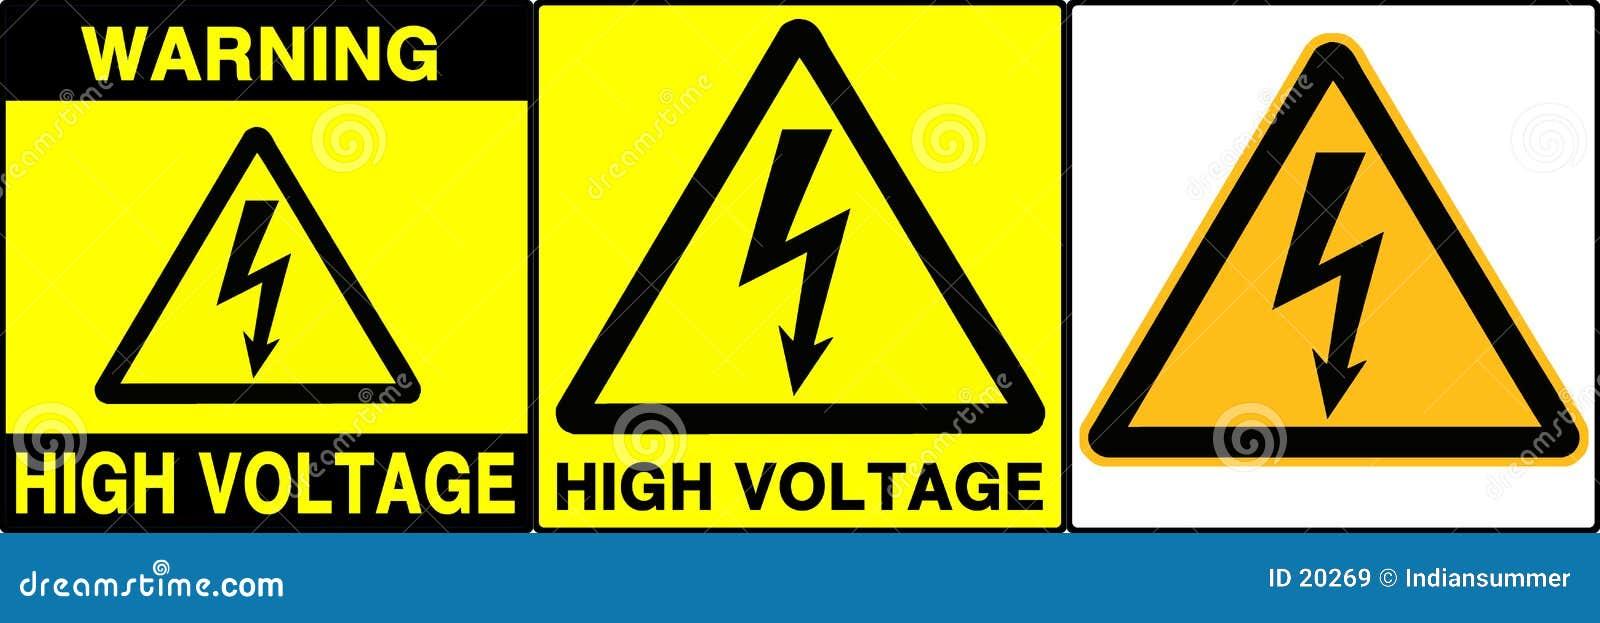 Caution/warning signs set, IV